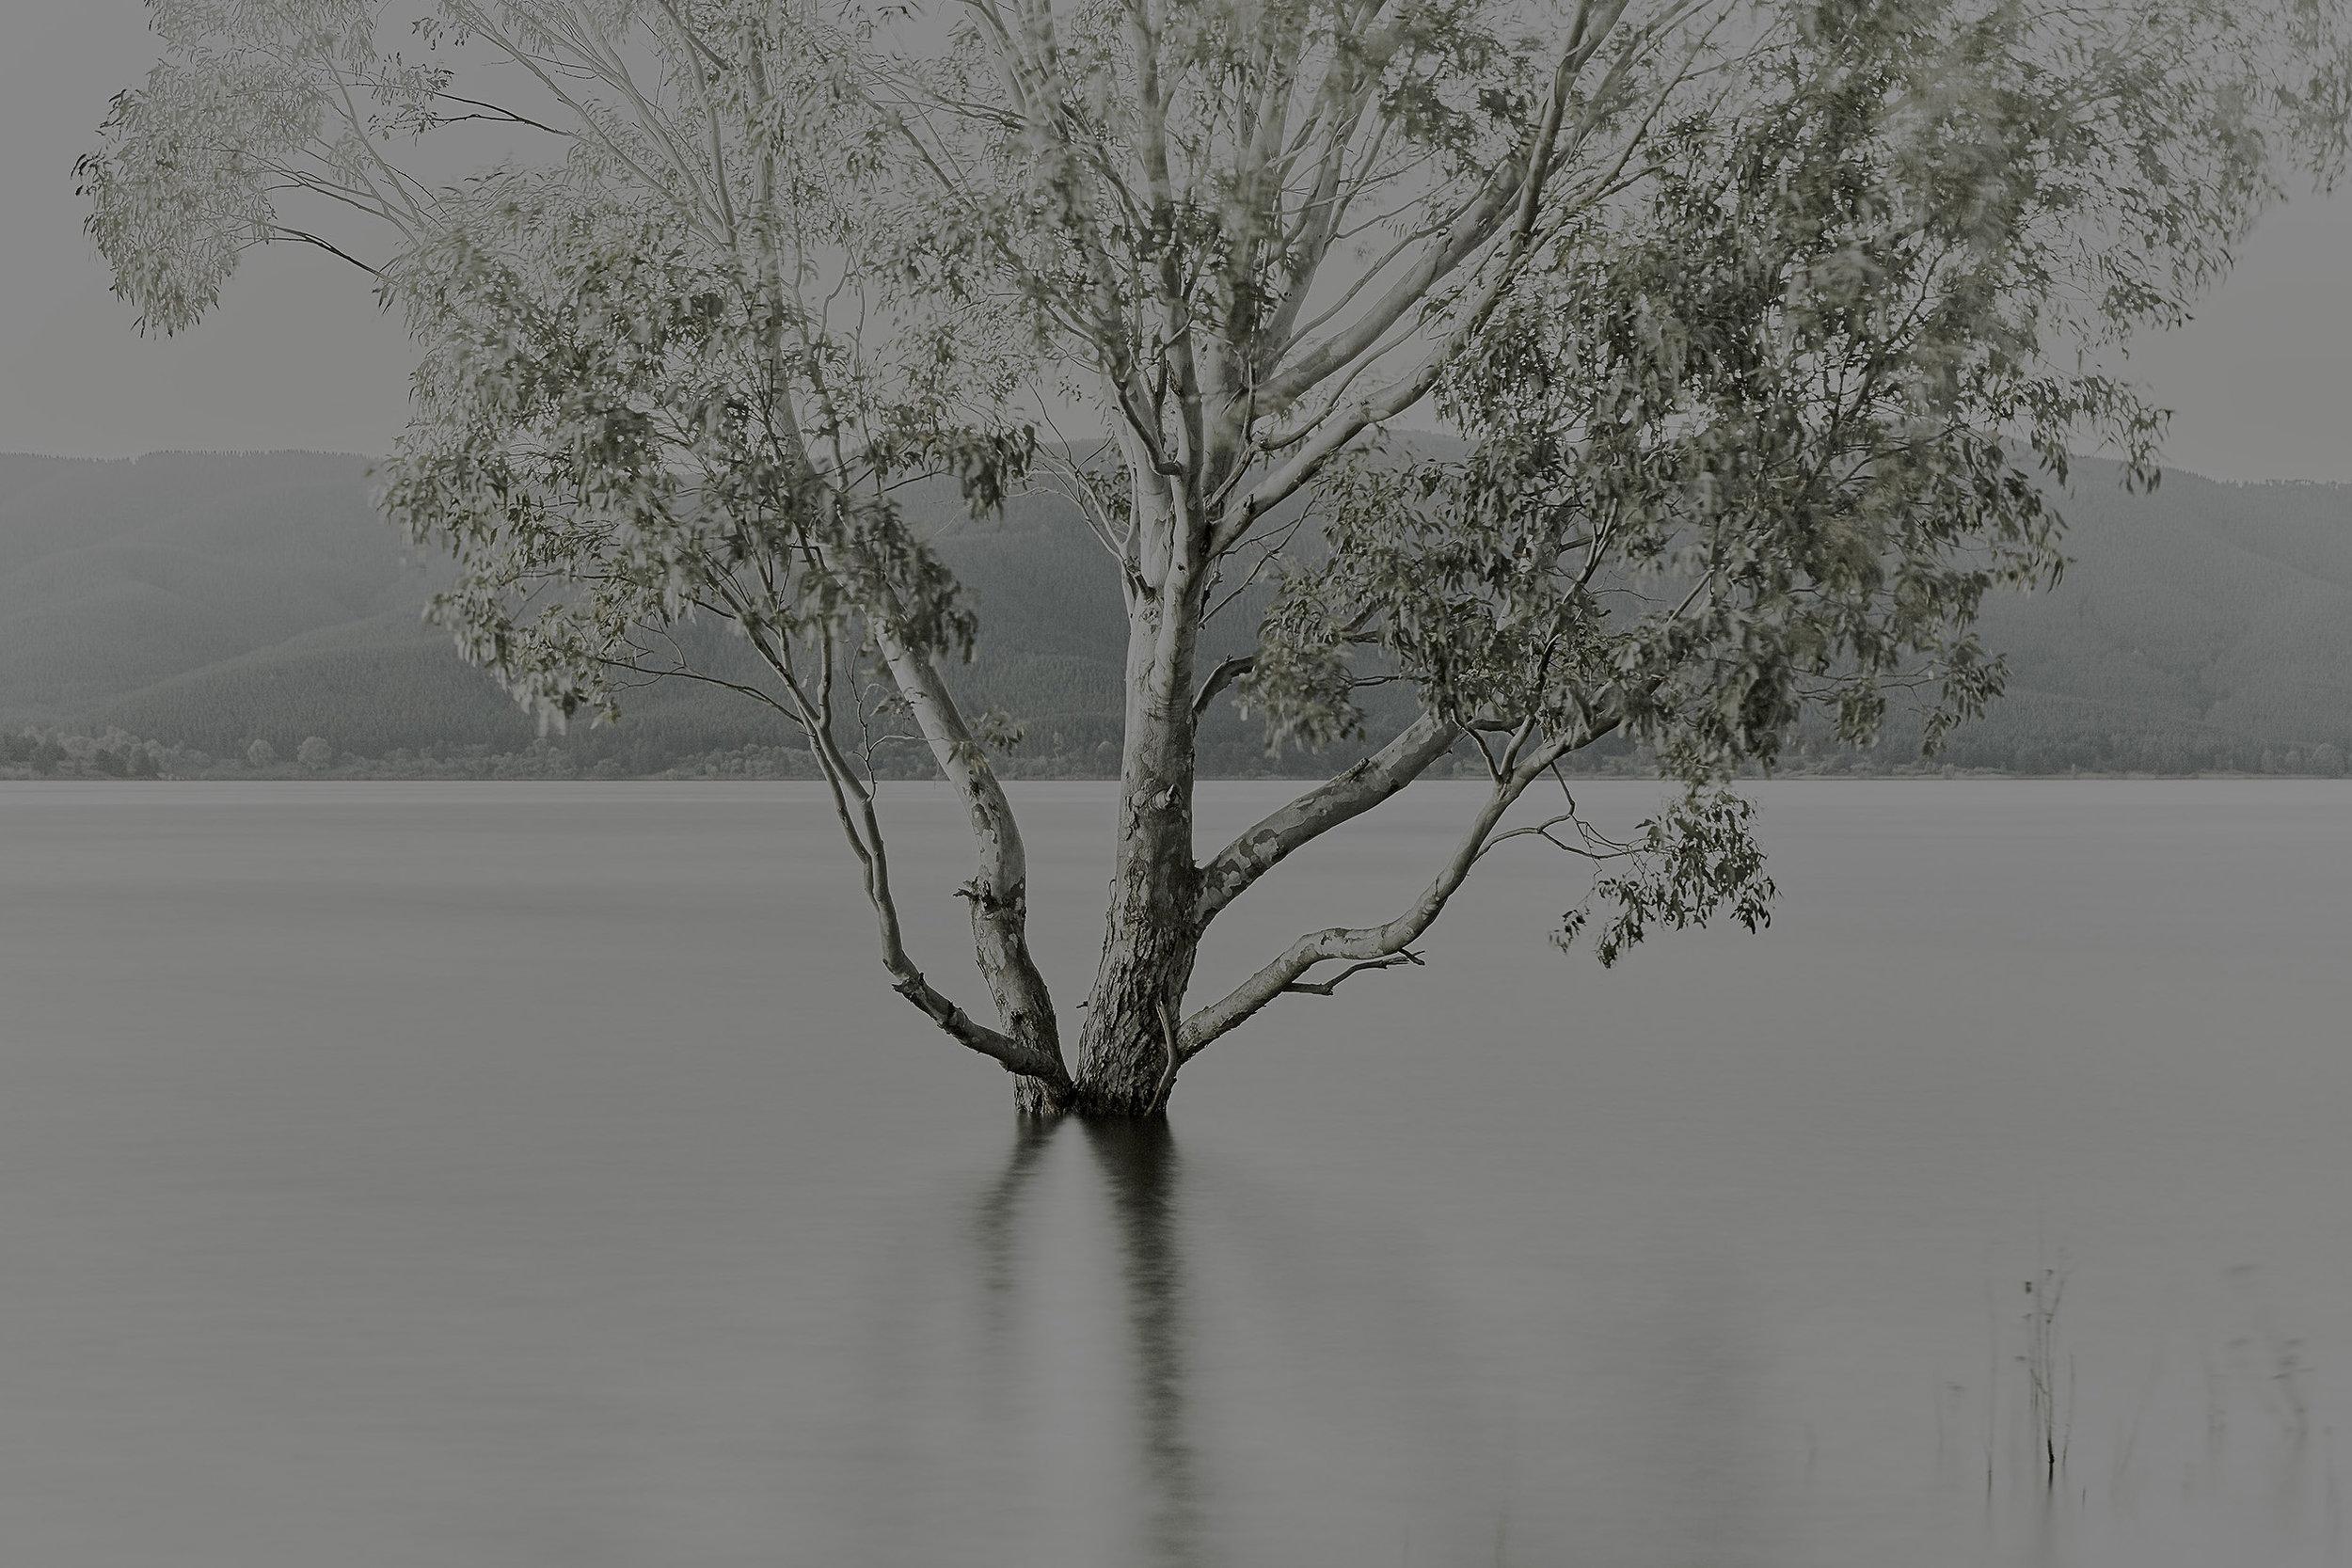 Patrick_Schuttler_Landscape_033.jpg